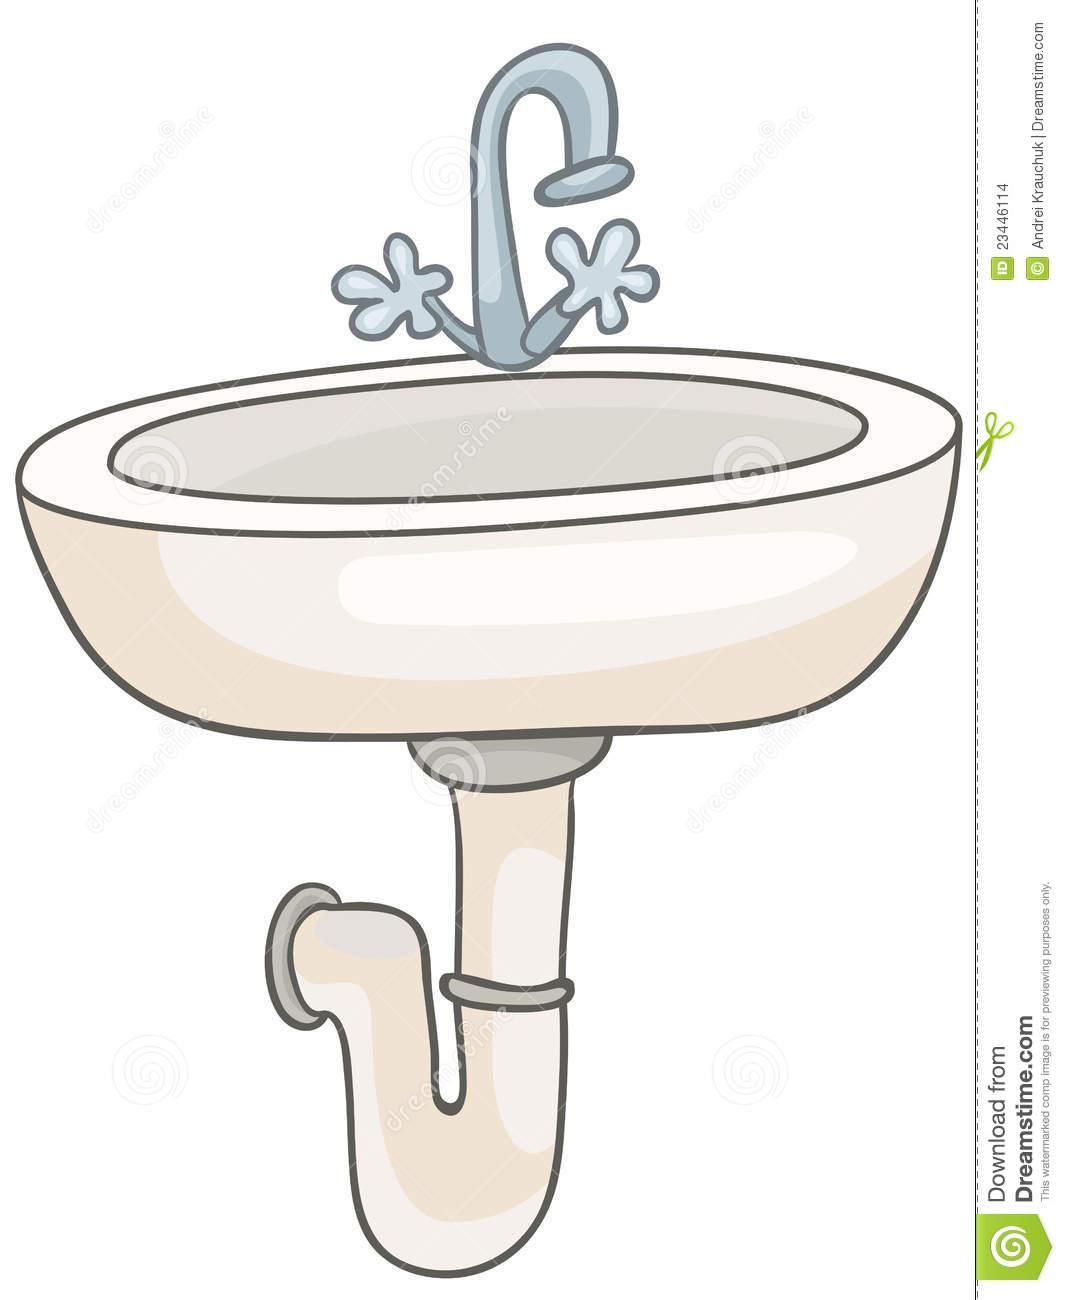 Sink Clipart & Sink Clip Art Images.